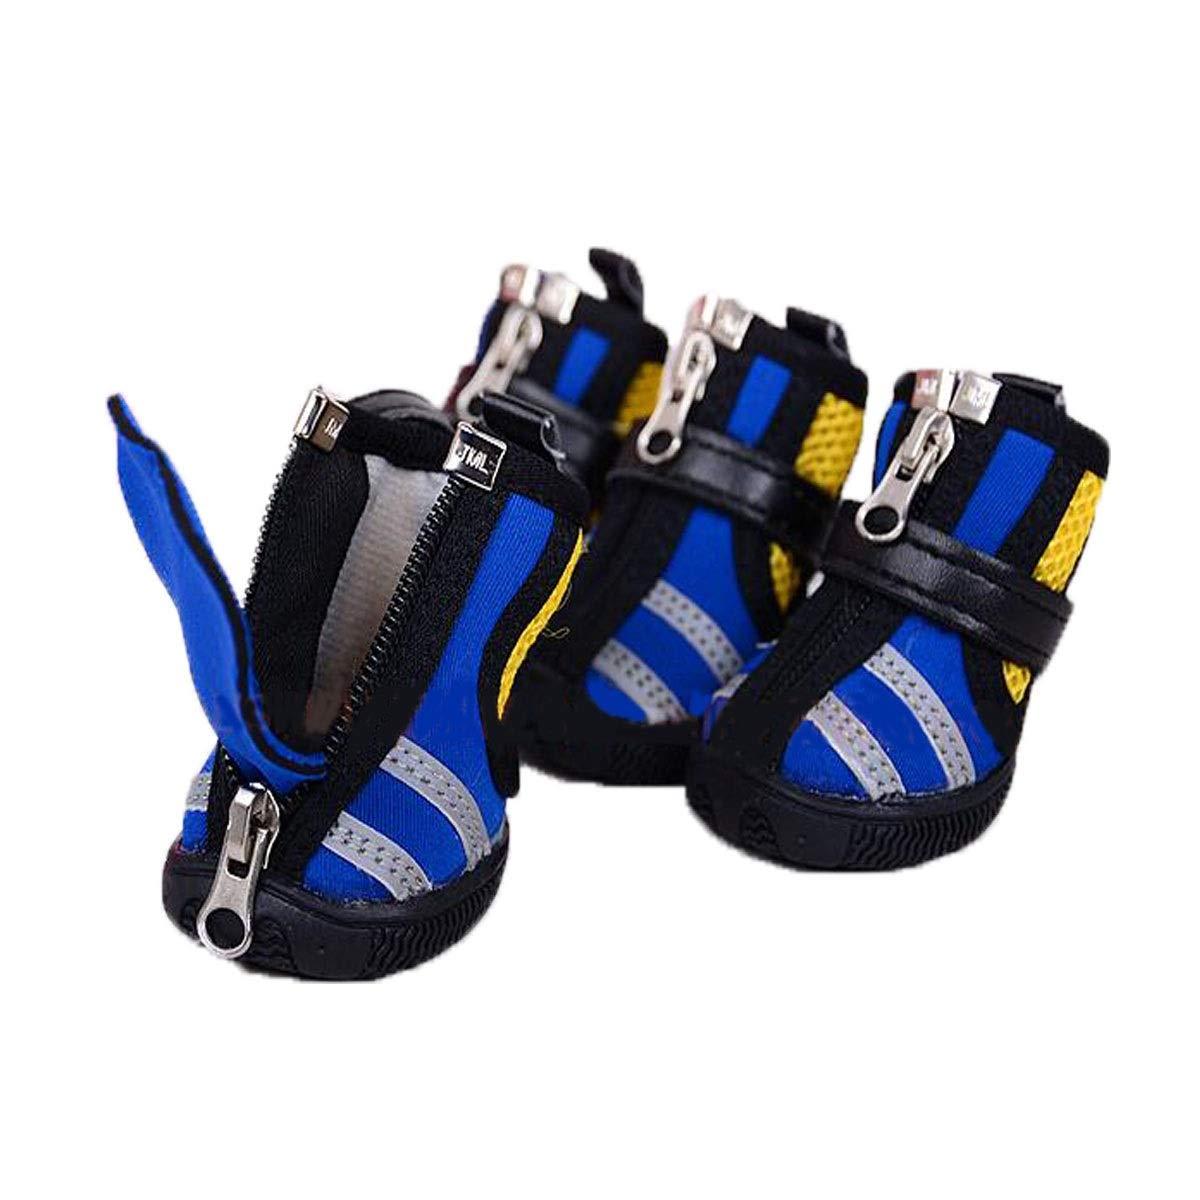 bluee No.5 bluee No.5 Muziwenju Dog shoes, Dog Sneakers, Medium Dog Casual Waterproof shoes, Dog Walking shoes, Pet Supplies, Red, bluee, Brown (1-5 (color   bluee, Size   No.5)